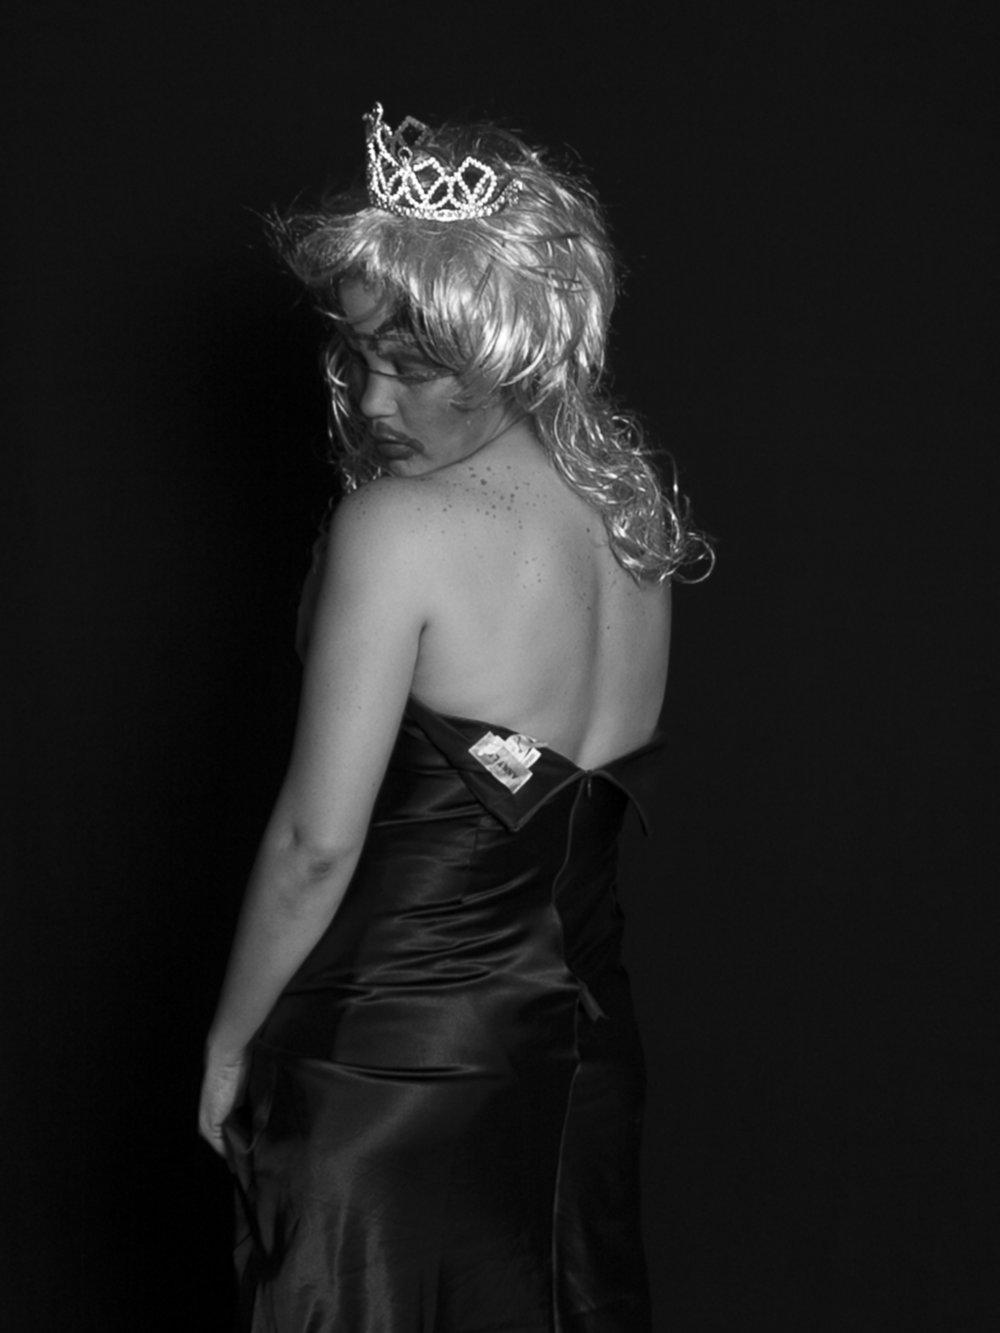 Yo queria ser Miss Venezuela